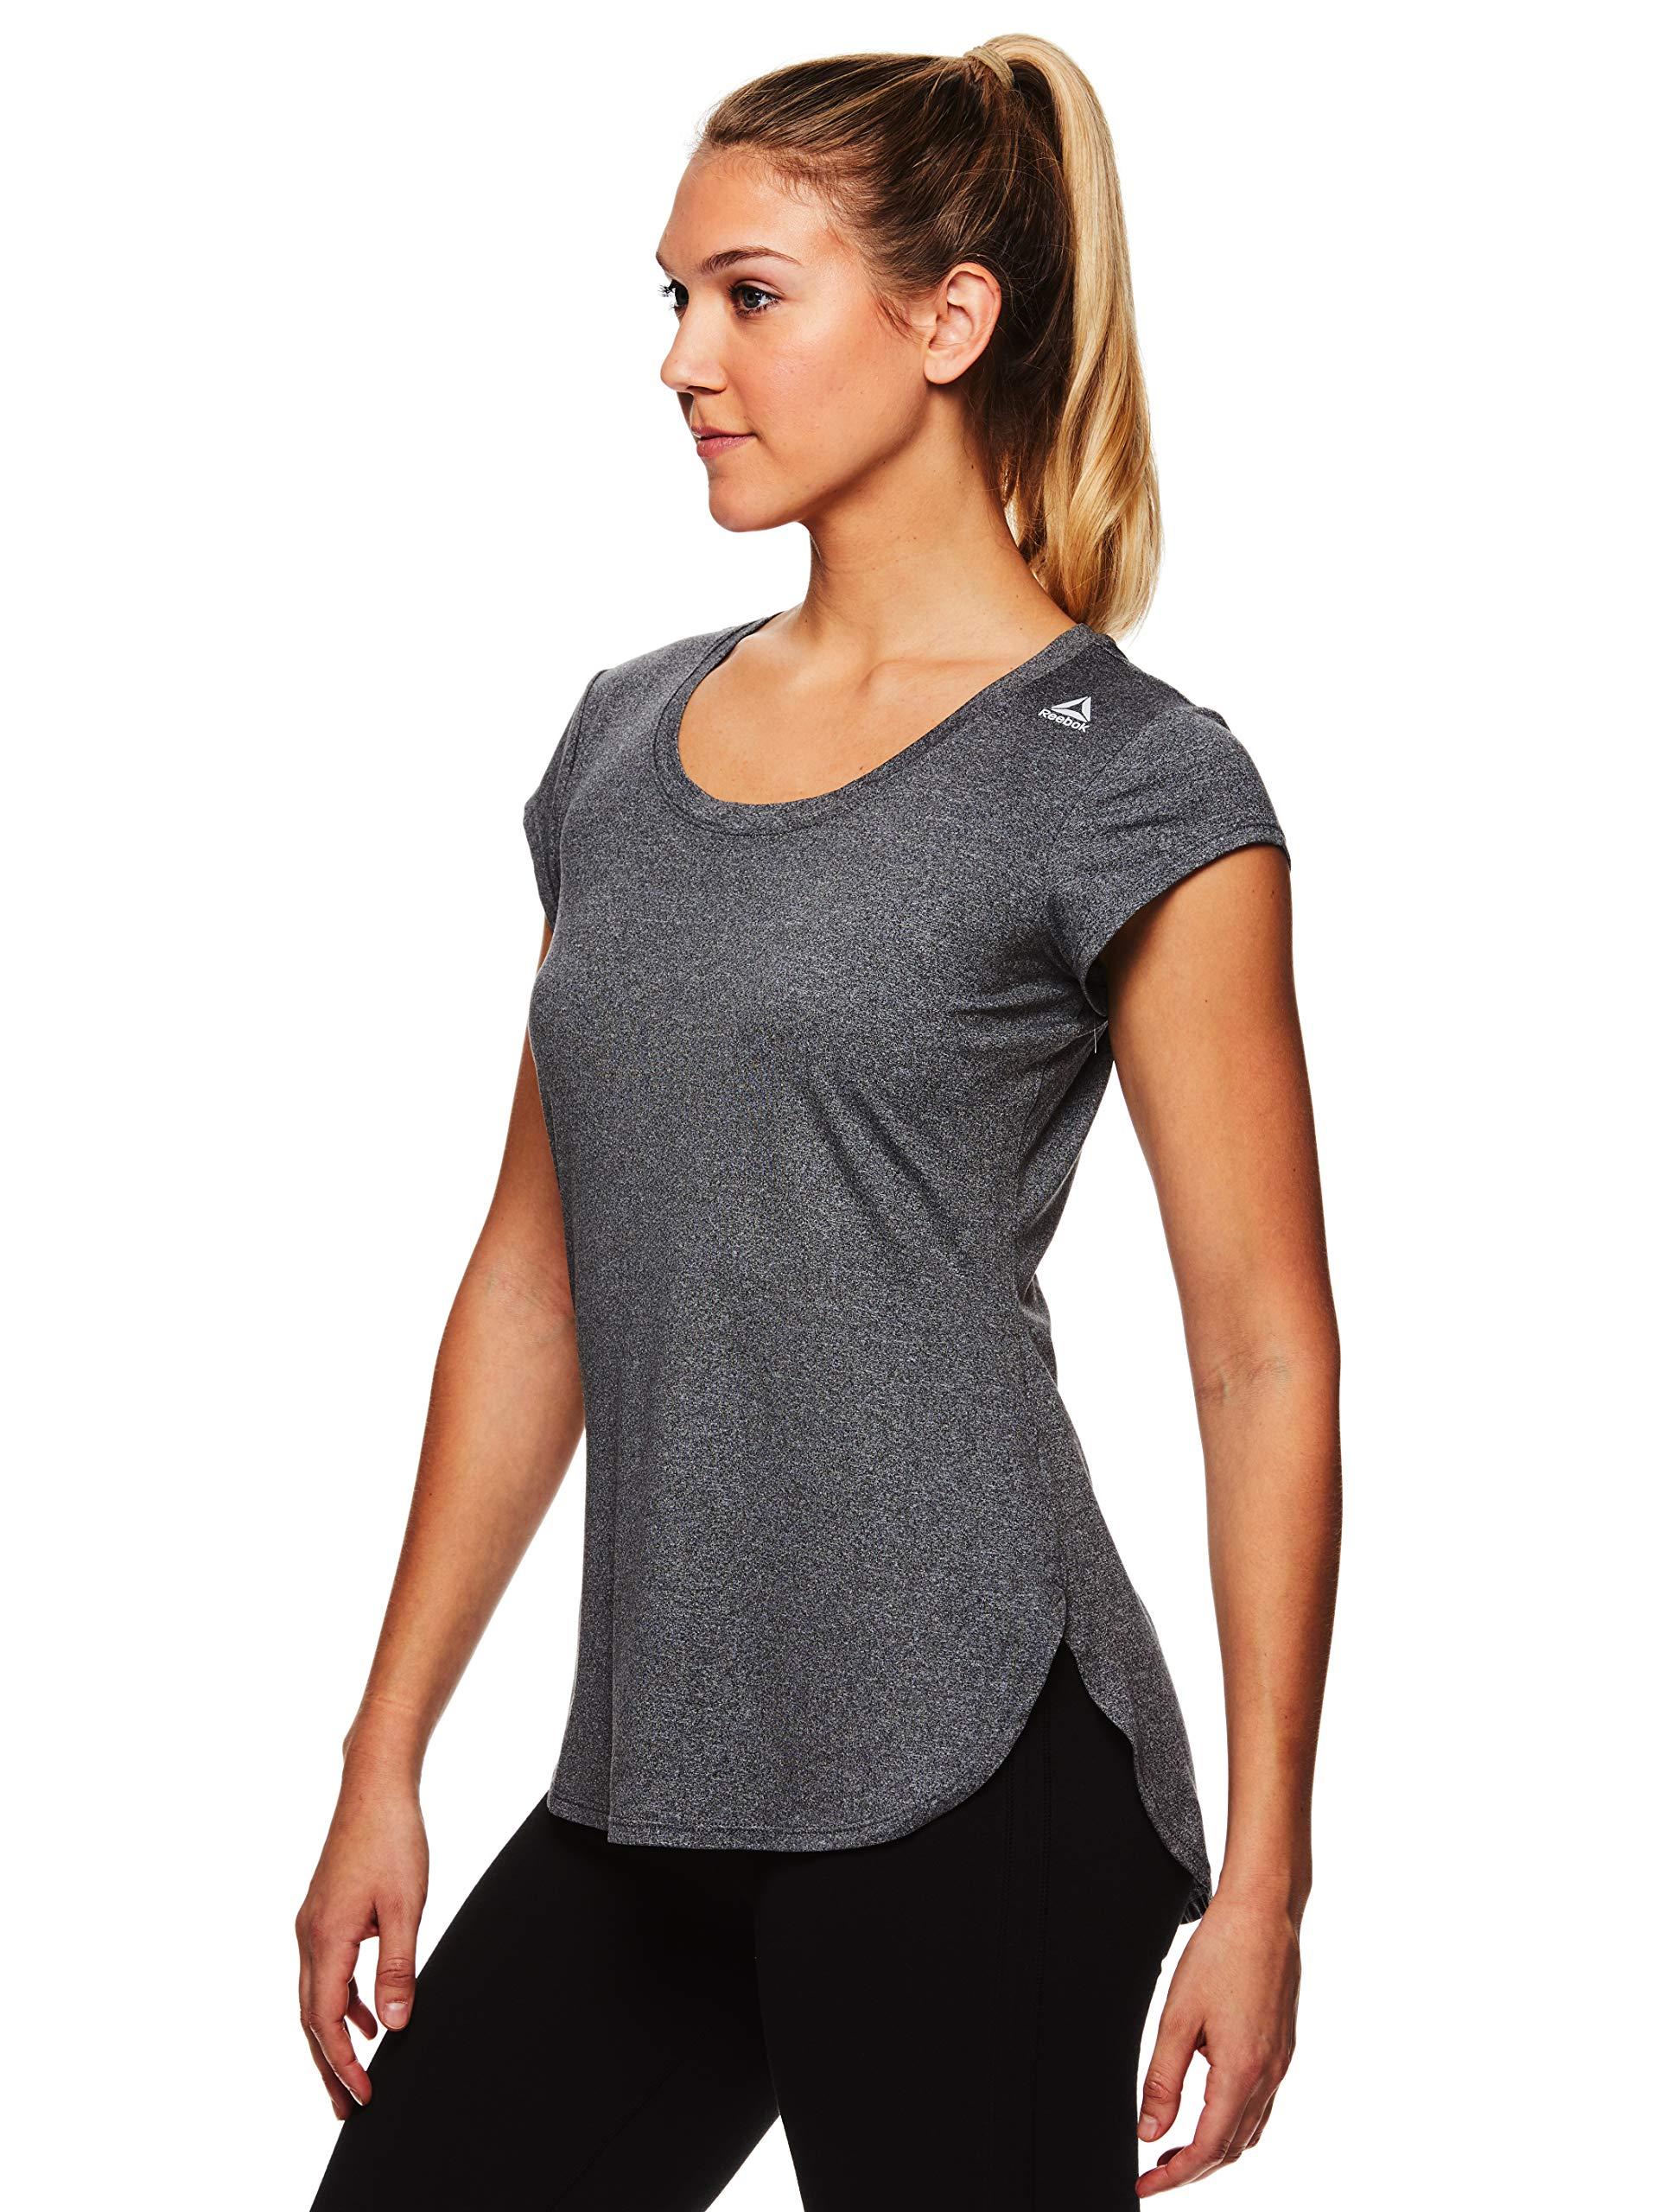 Reebok Women's Legend Performance Short Sleeve T-Shirt with Polyspan Fabric - Charcoal Semi Heather, X-Small by Reebok (Image #2)